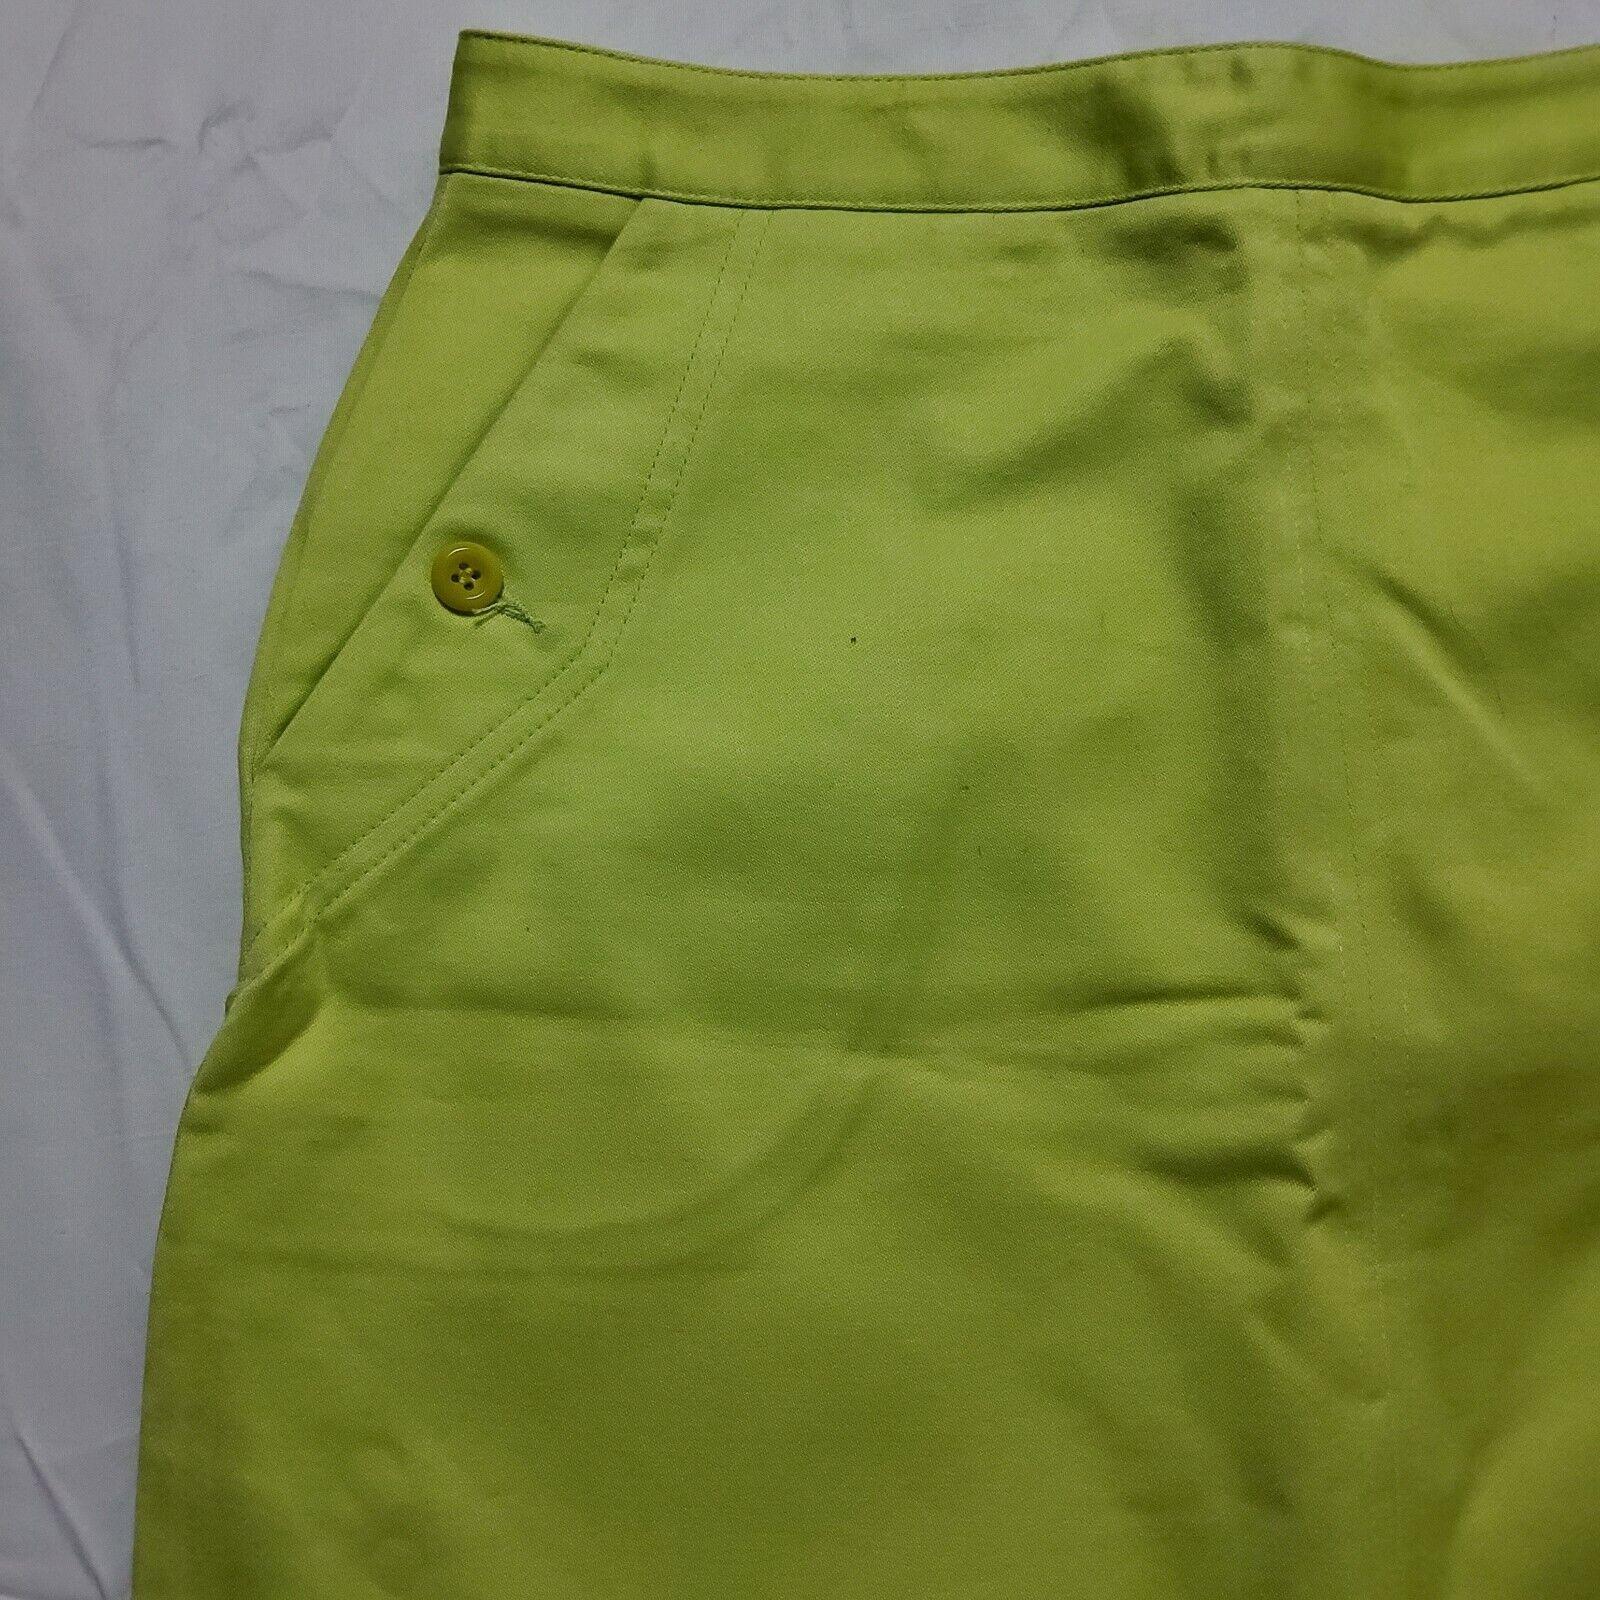 Esprit Neon Green Skirt - image 3